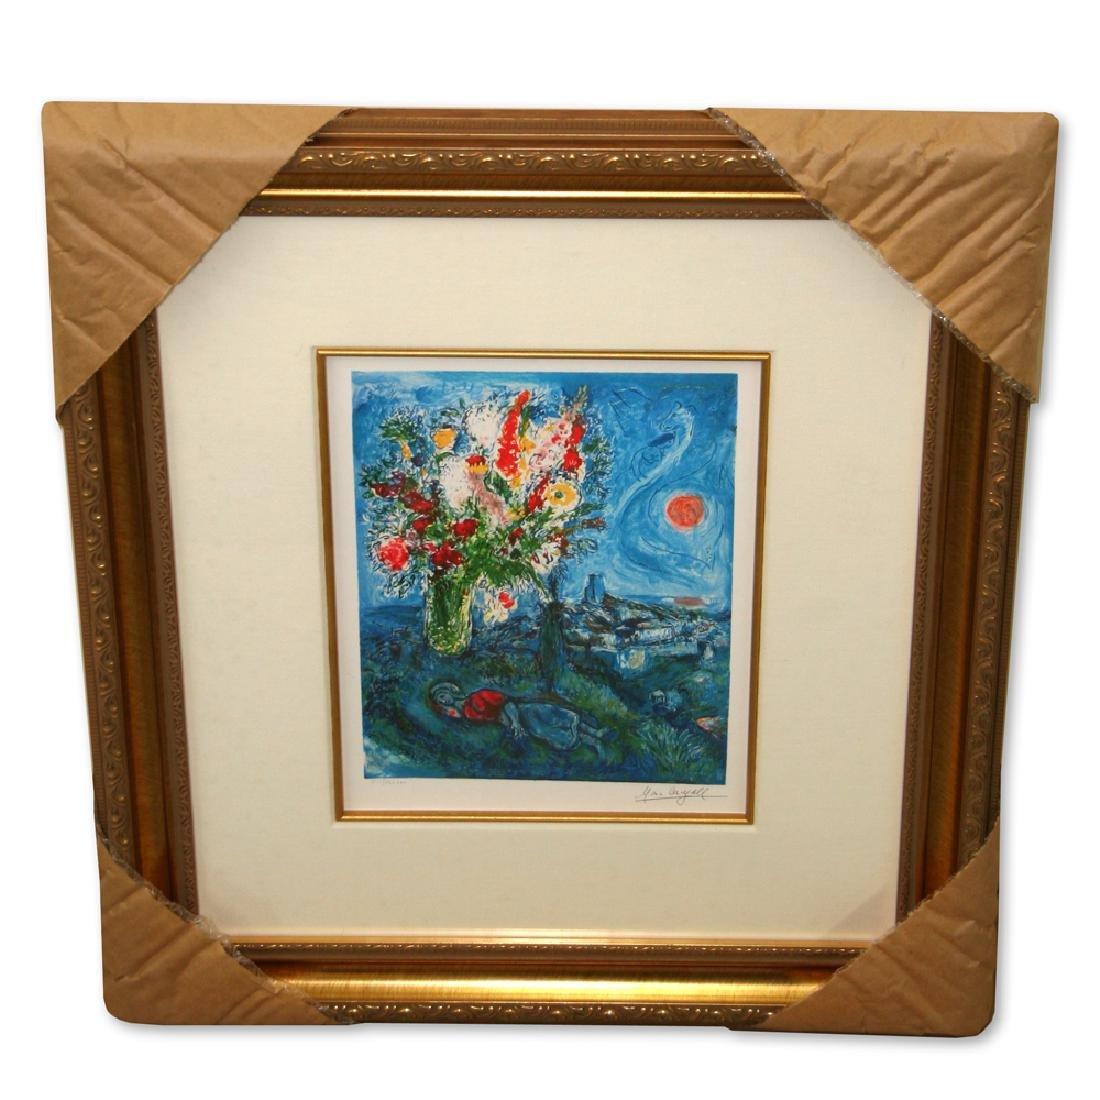 Chagall (After) 'La Dormeuse Aux Fleurs' Framed